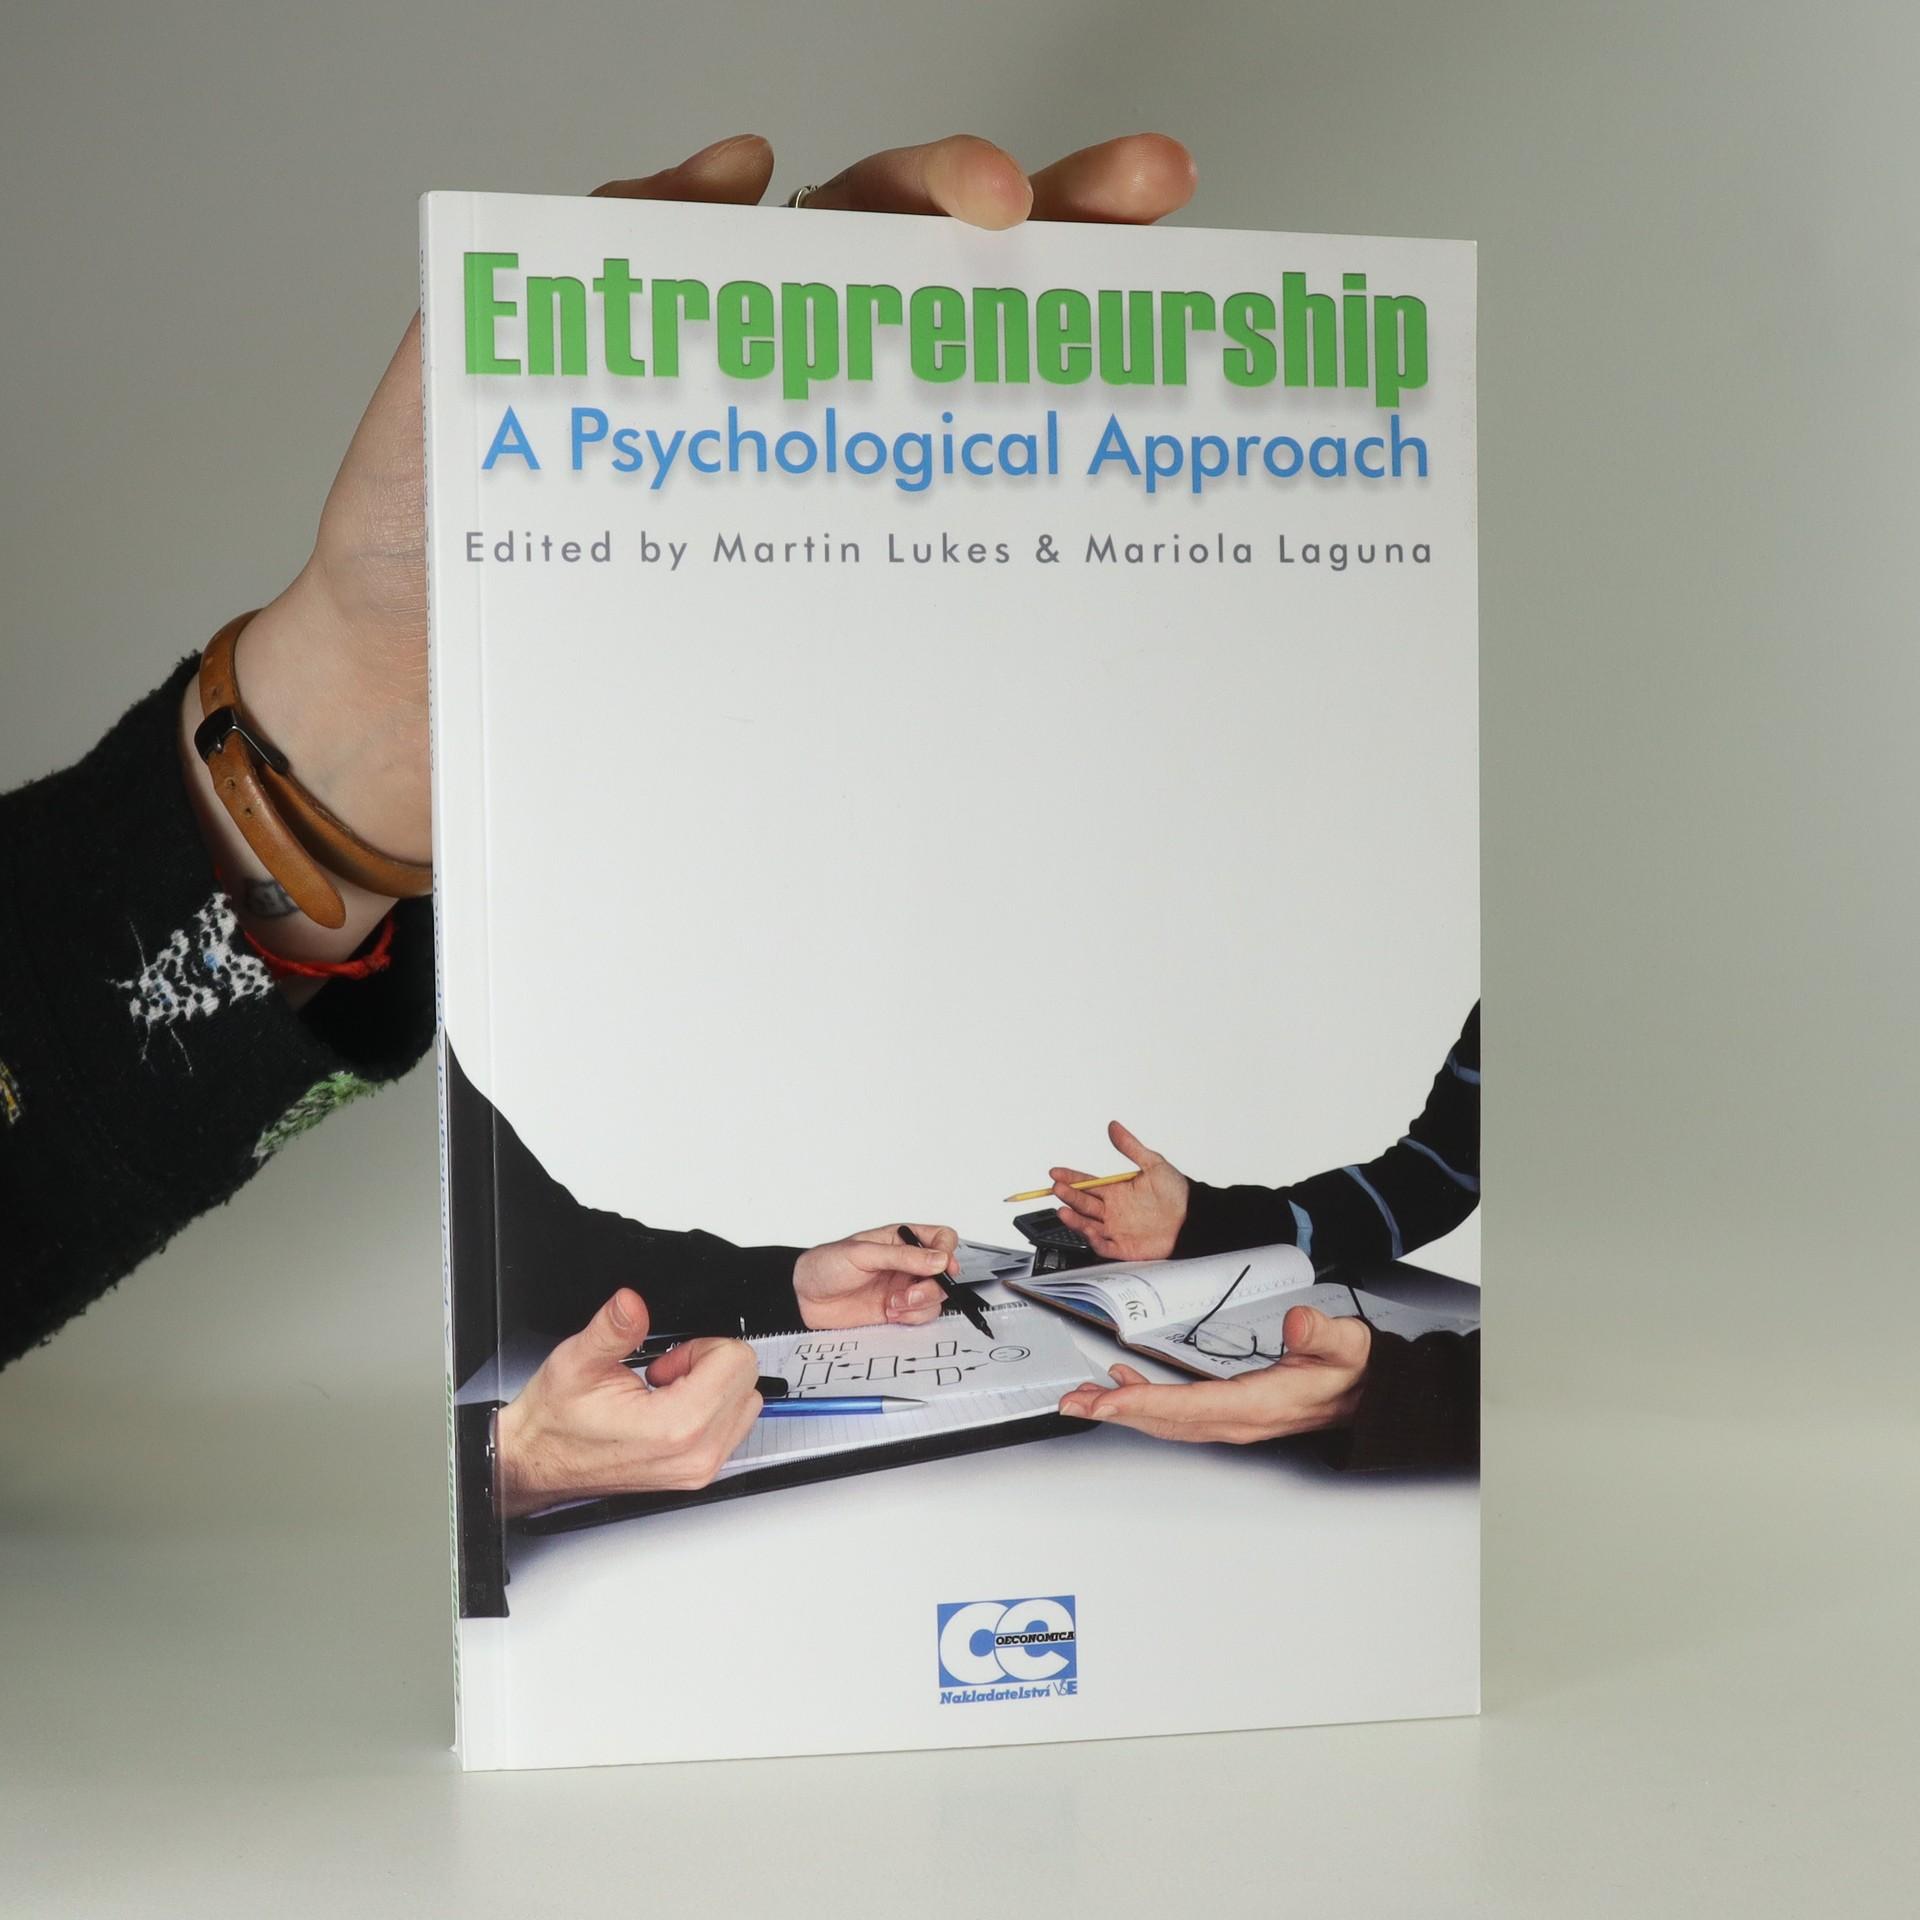 antikvární kniha Entrepreneurship. A Psychological Approach, neuveden